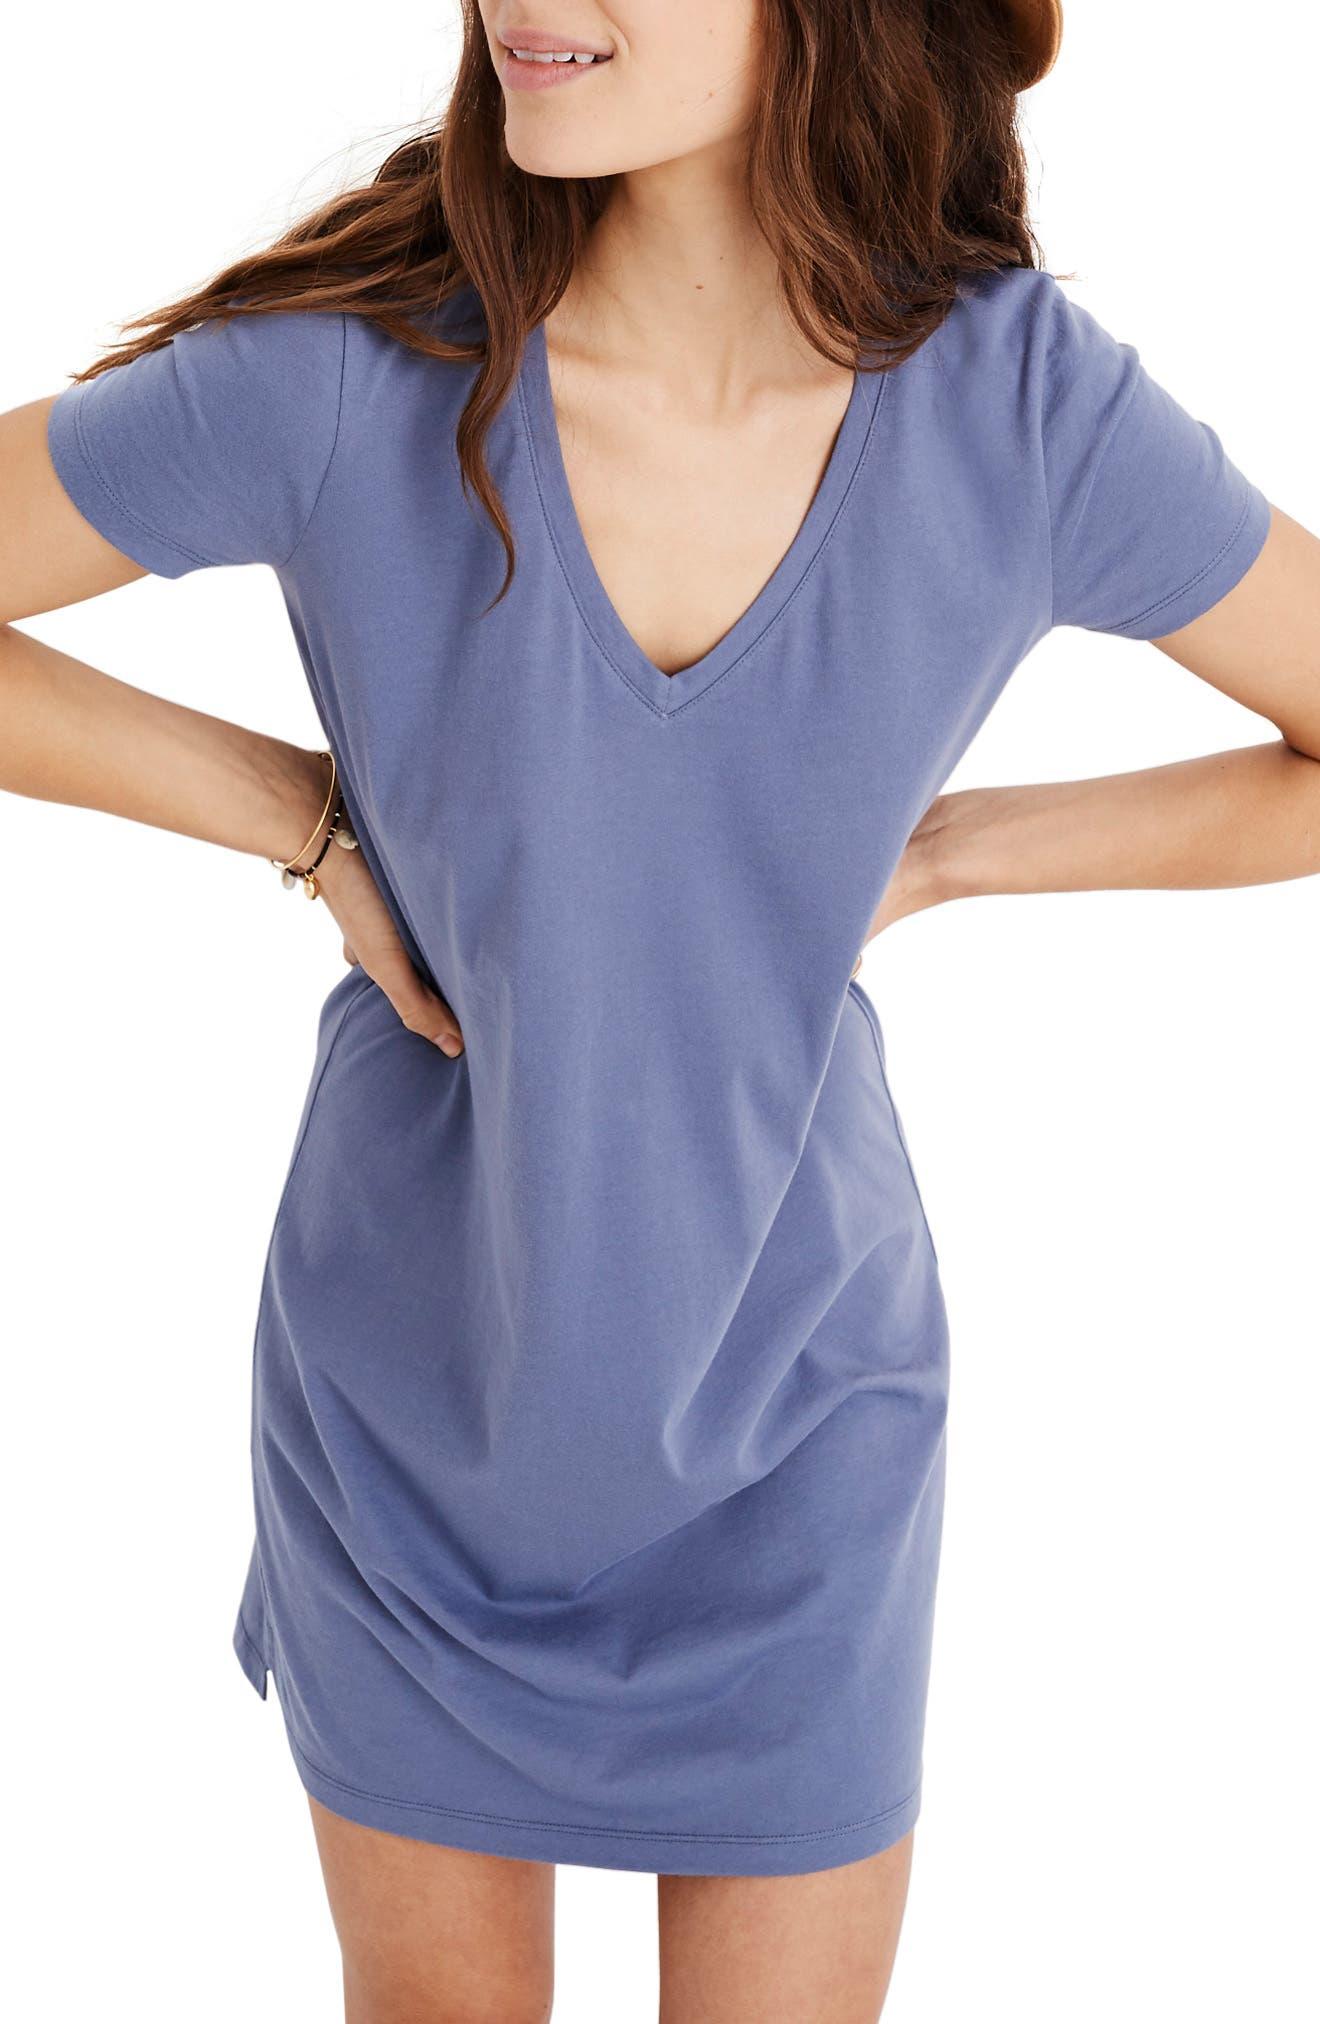 MADEWELL Northside V-Neck T-Shirt Dress, Main, color, PALE SHADOW